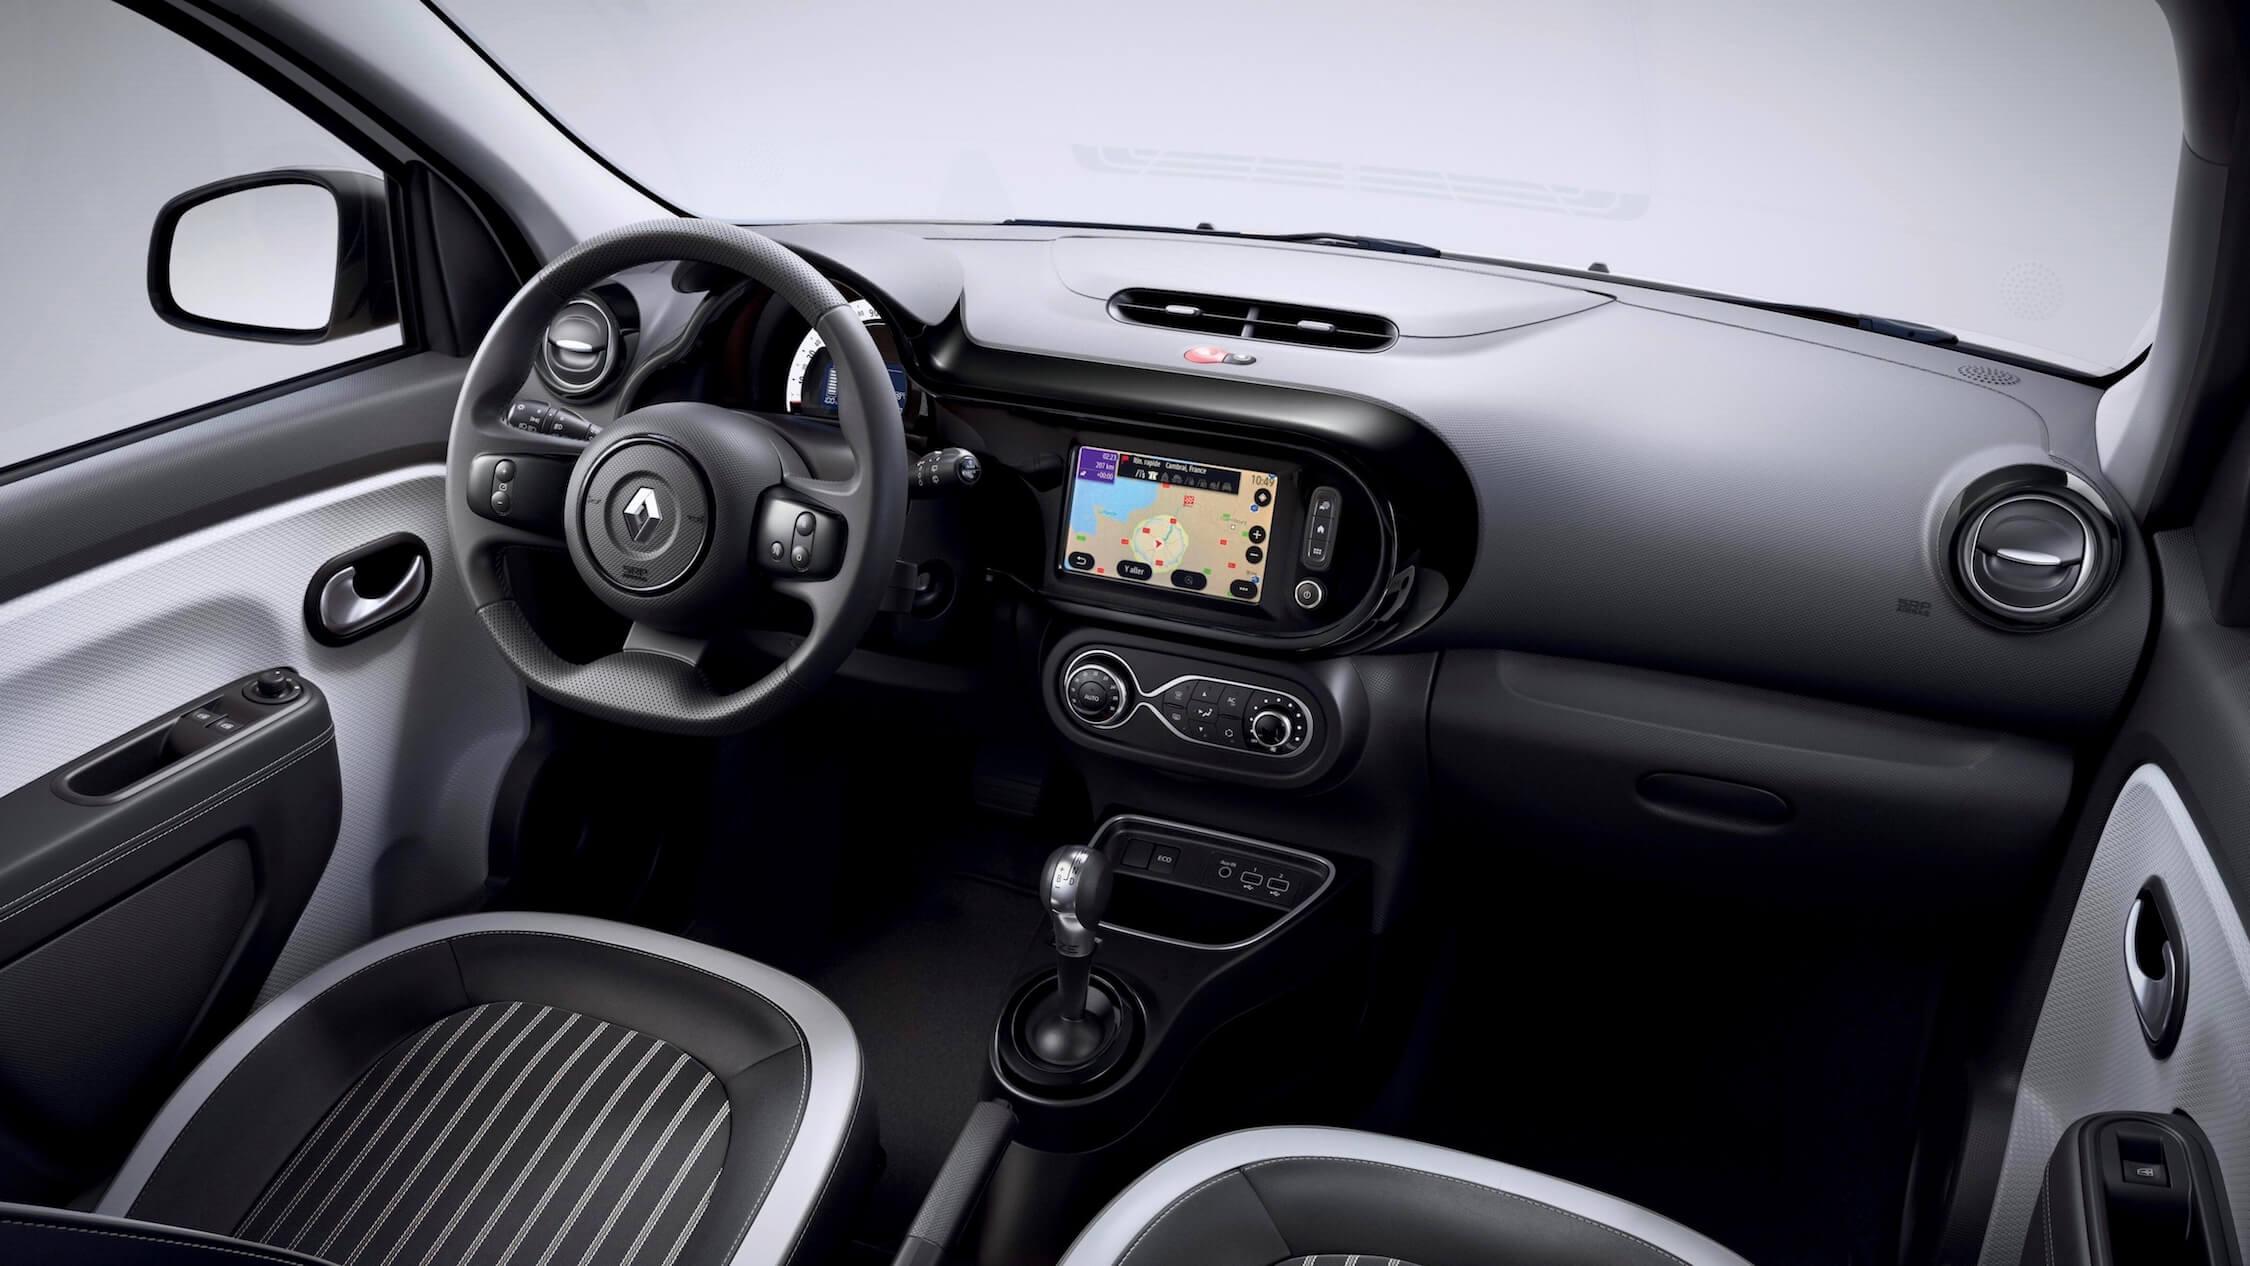 Renault Twingo ZE elétrico interior preto